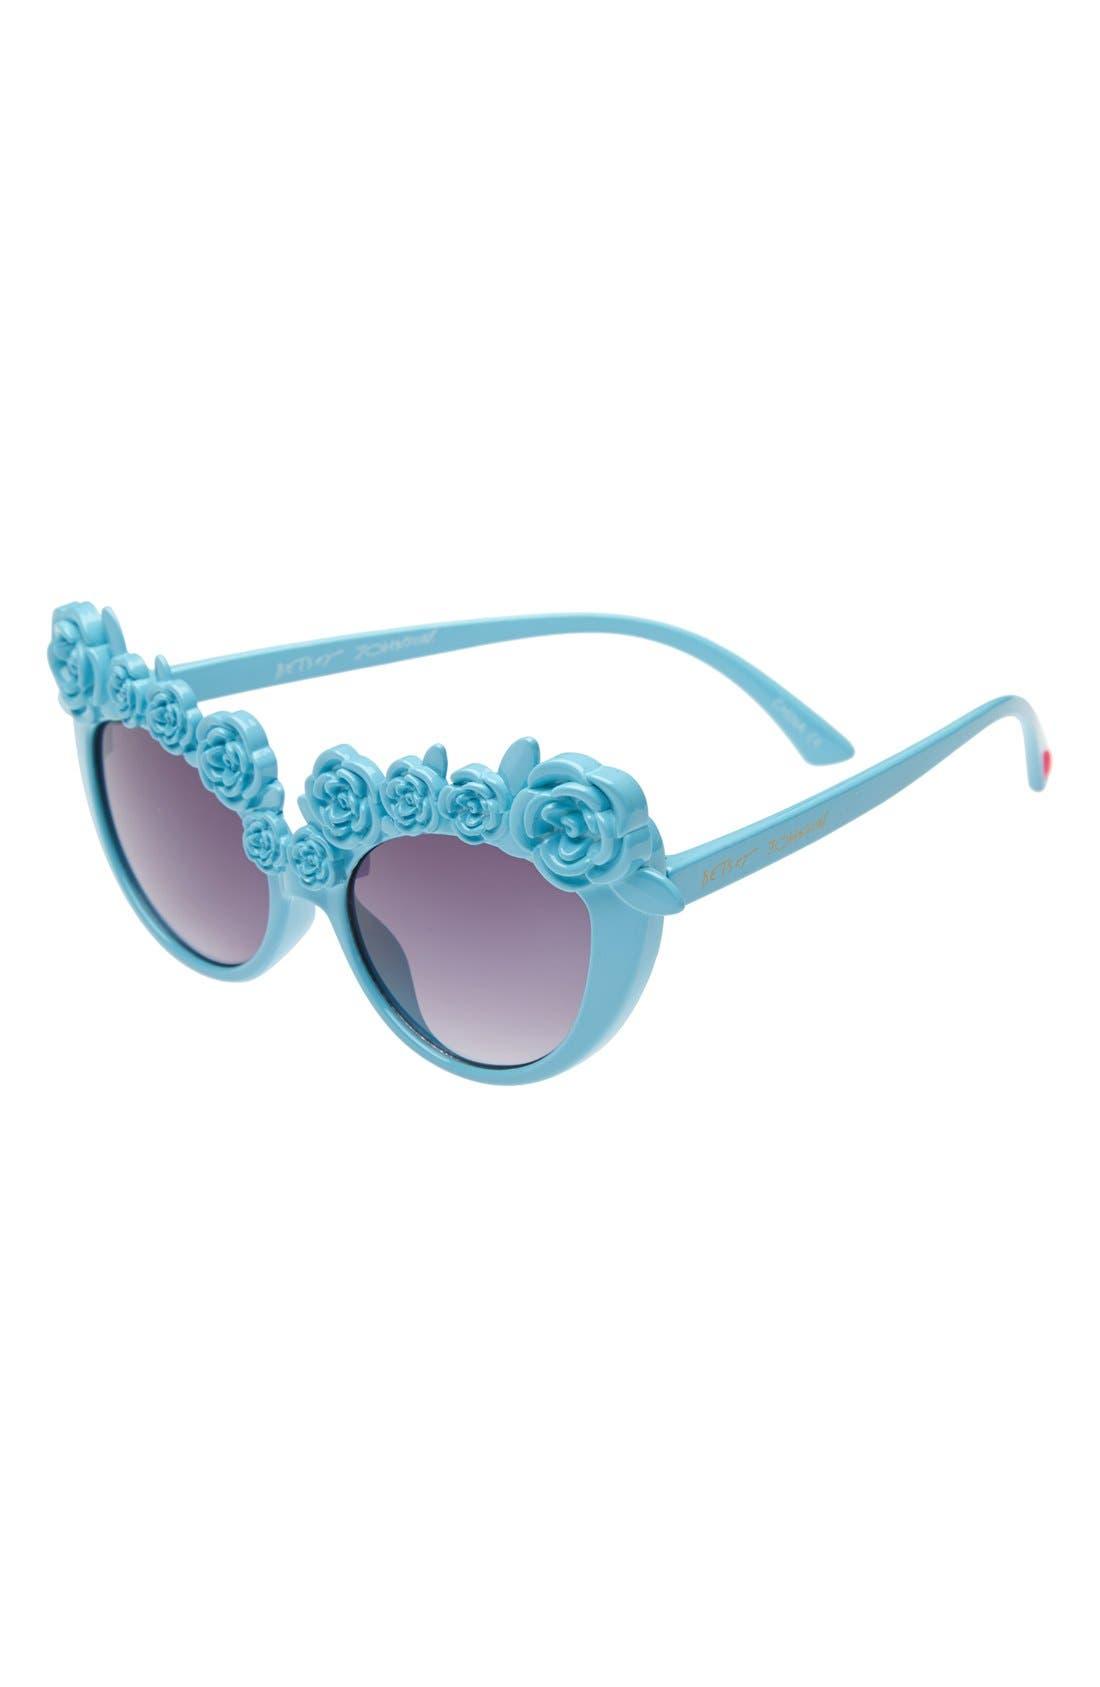 Cat Eye Sunglasses,                         Main,                         color, Turquoise